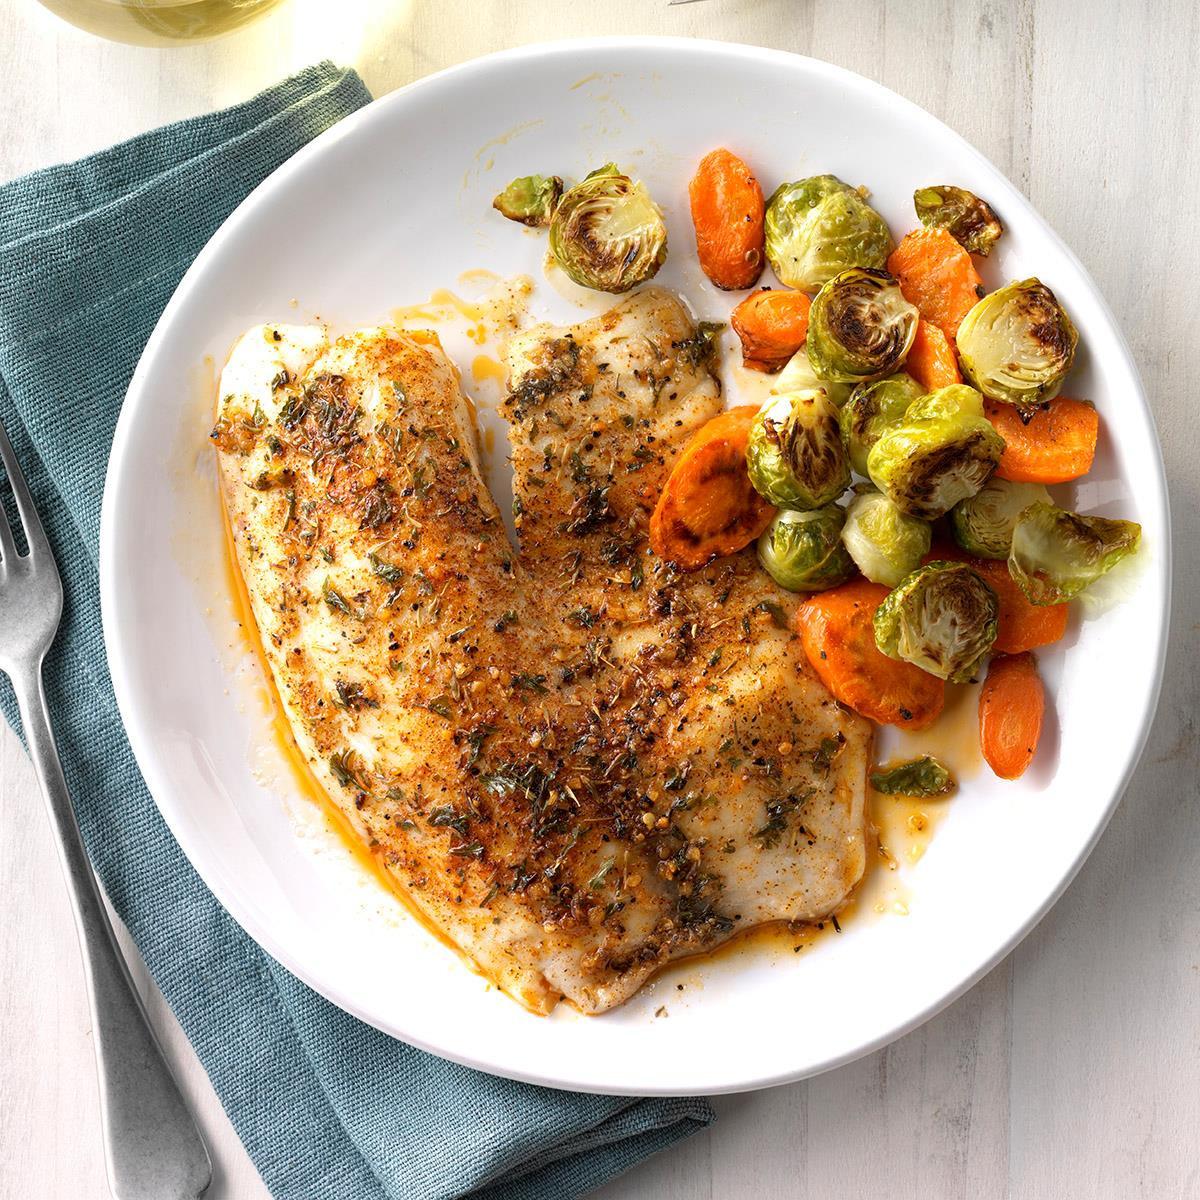 Healthy Tilapia Fish Recipes  Seasoned Tilapia Fillets Recipe